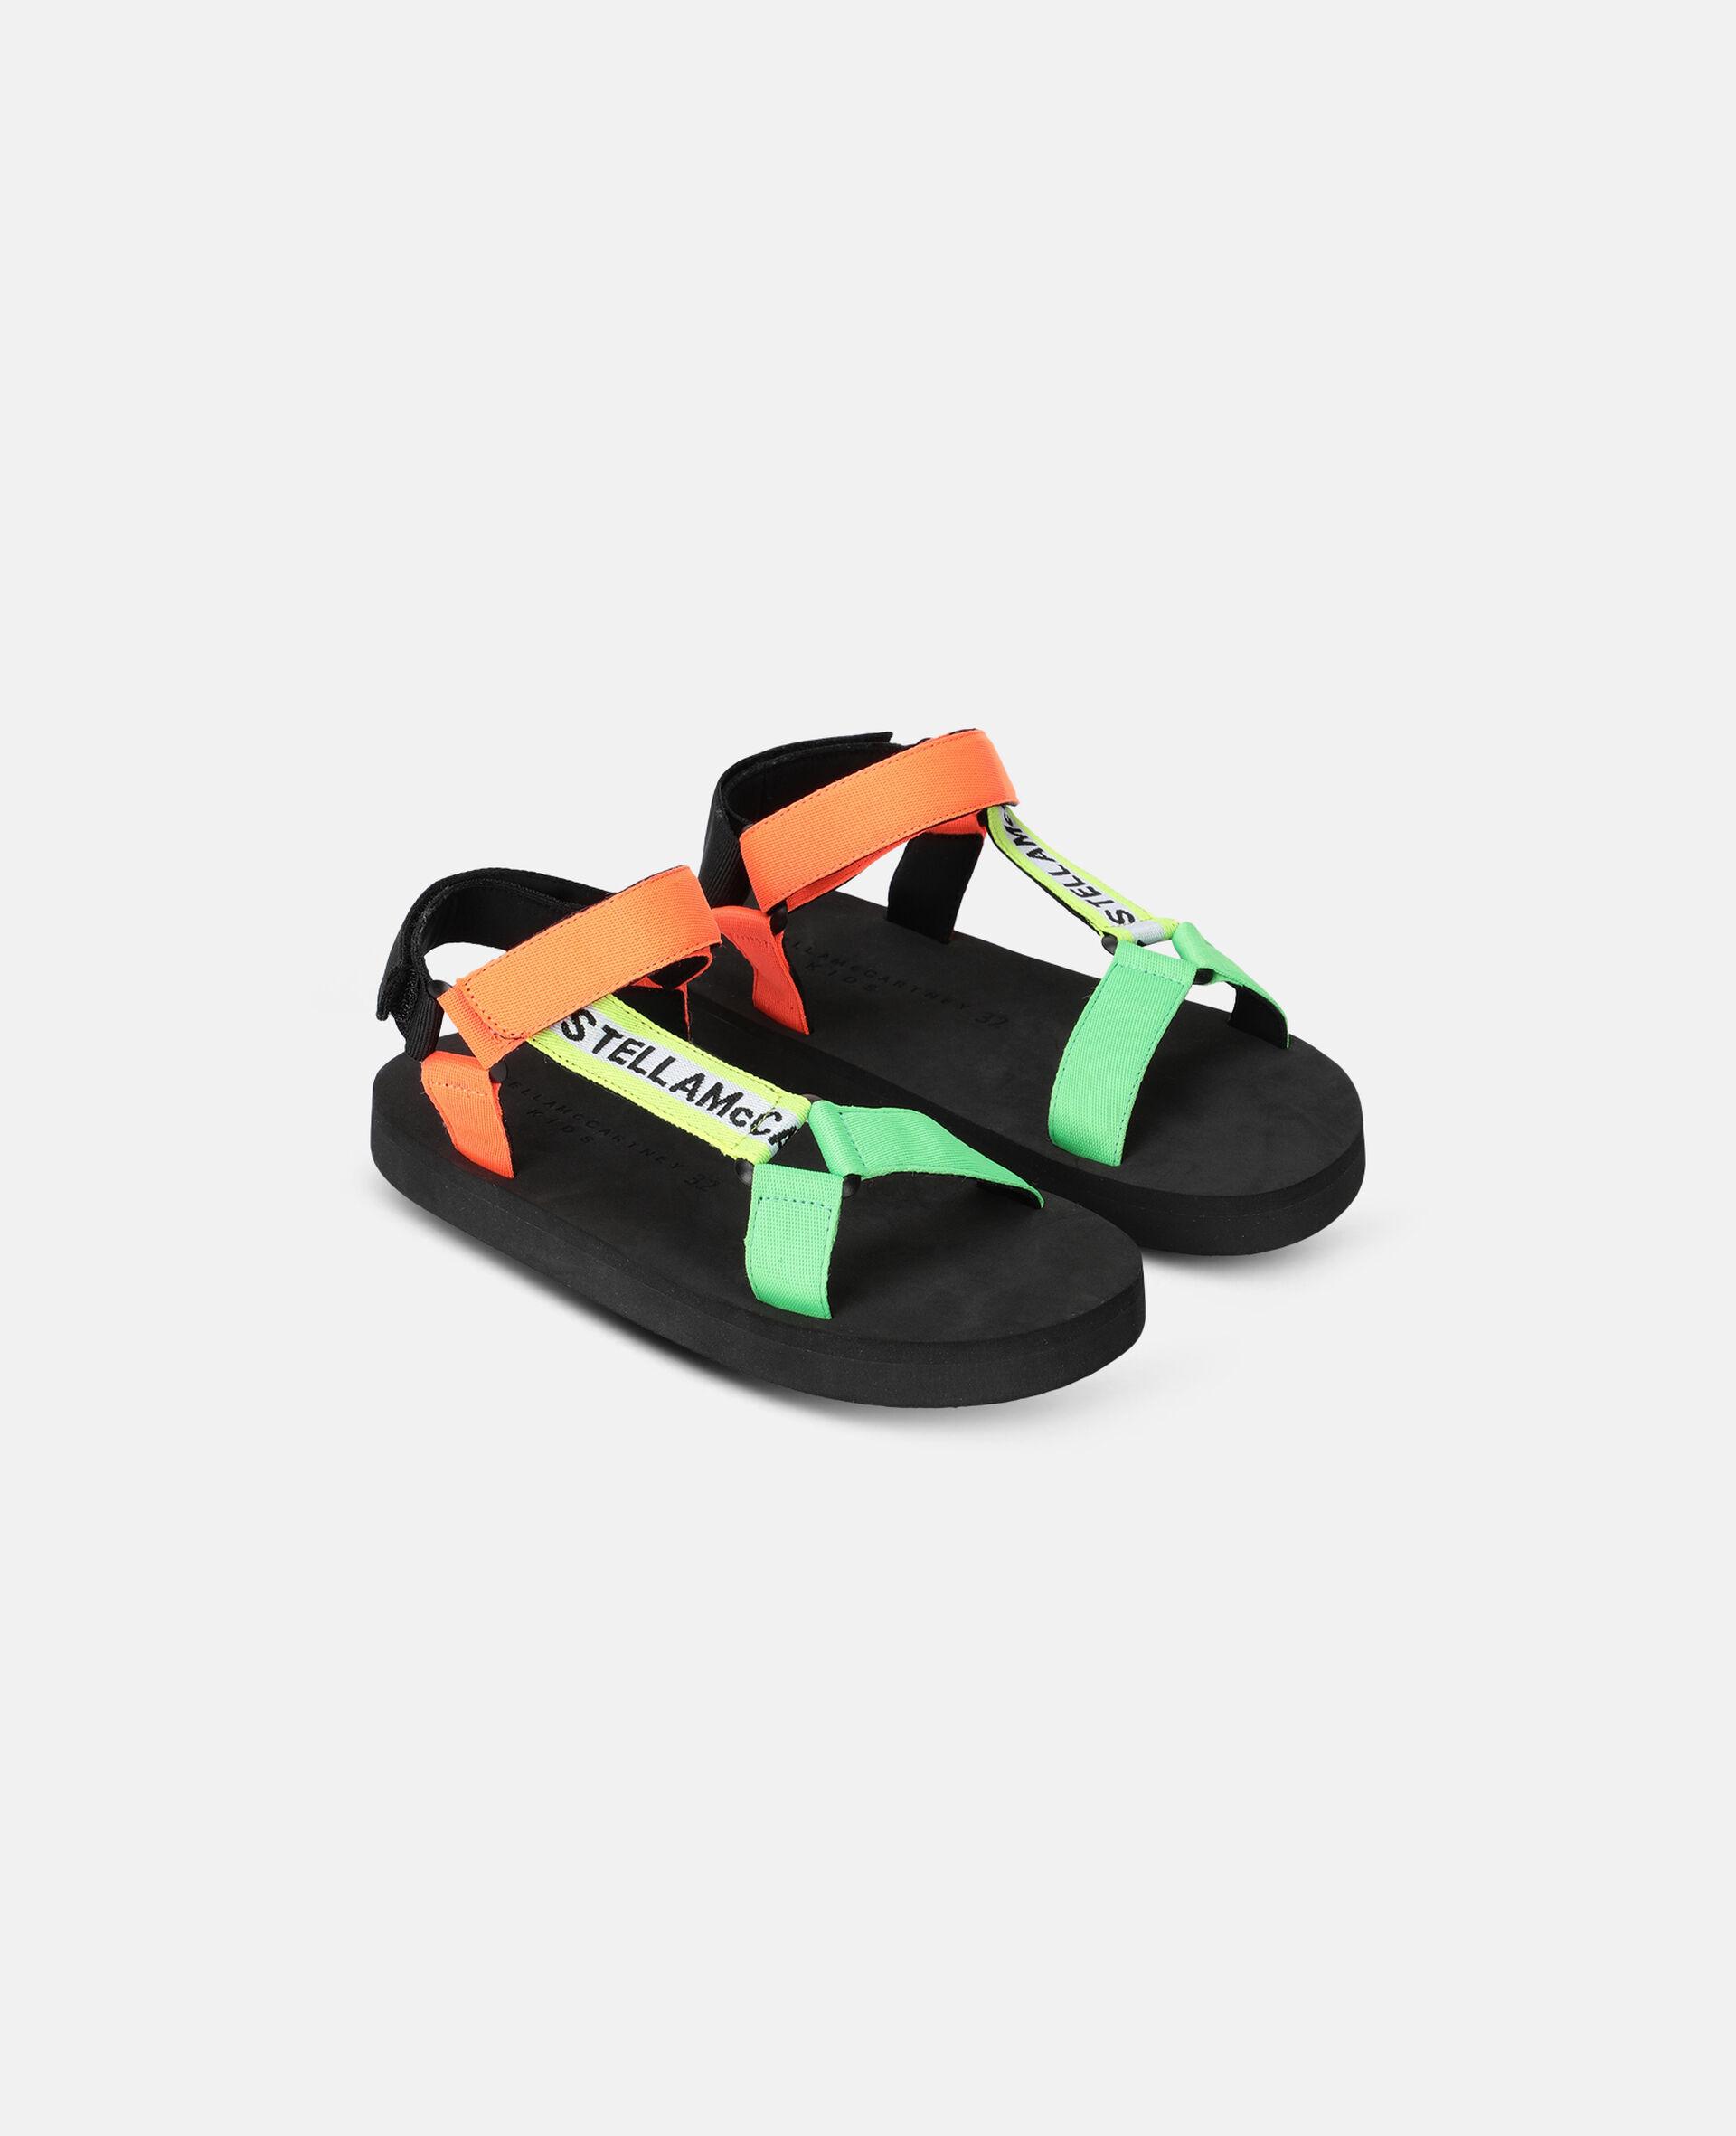 Multicolor Tape Sandals -Multicolour-large image number 3